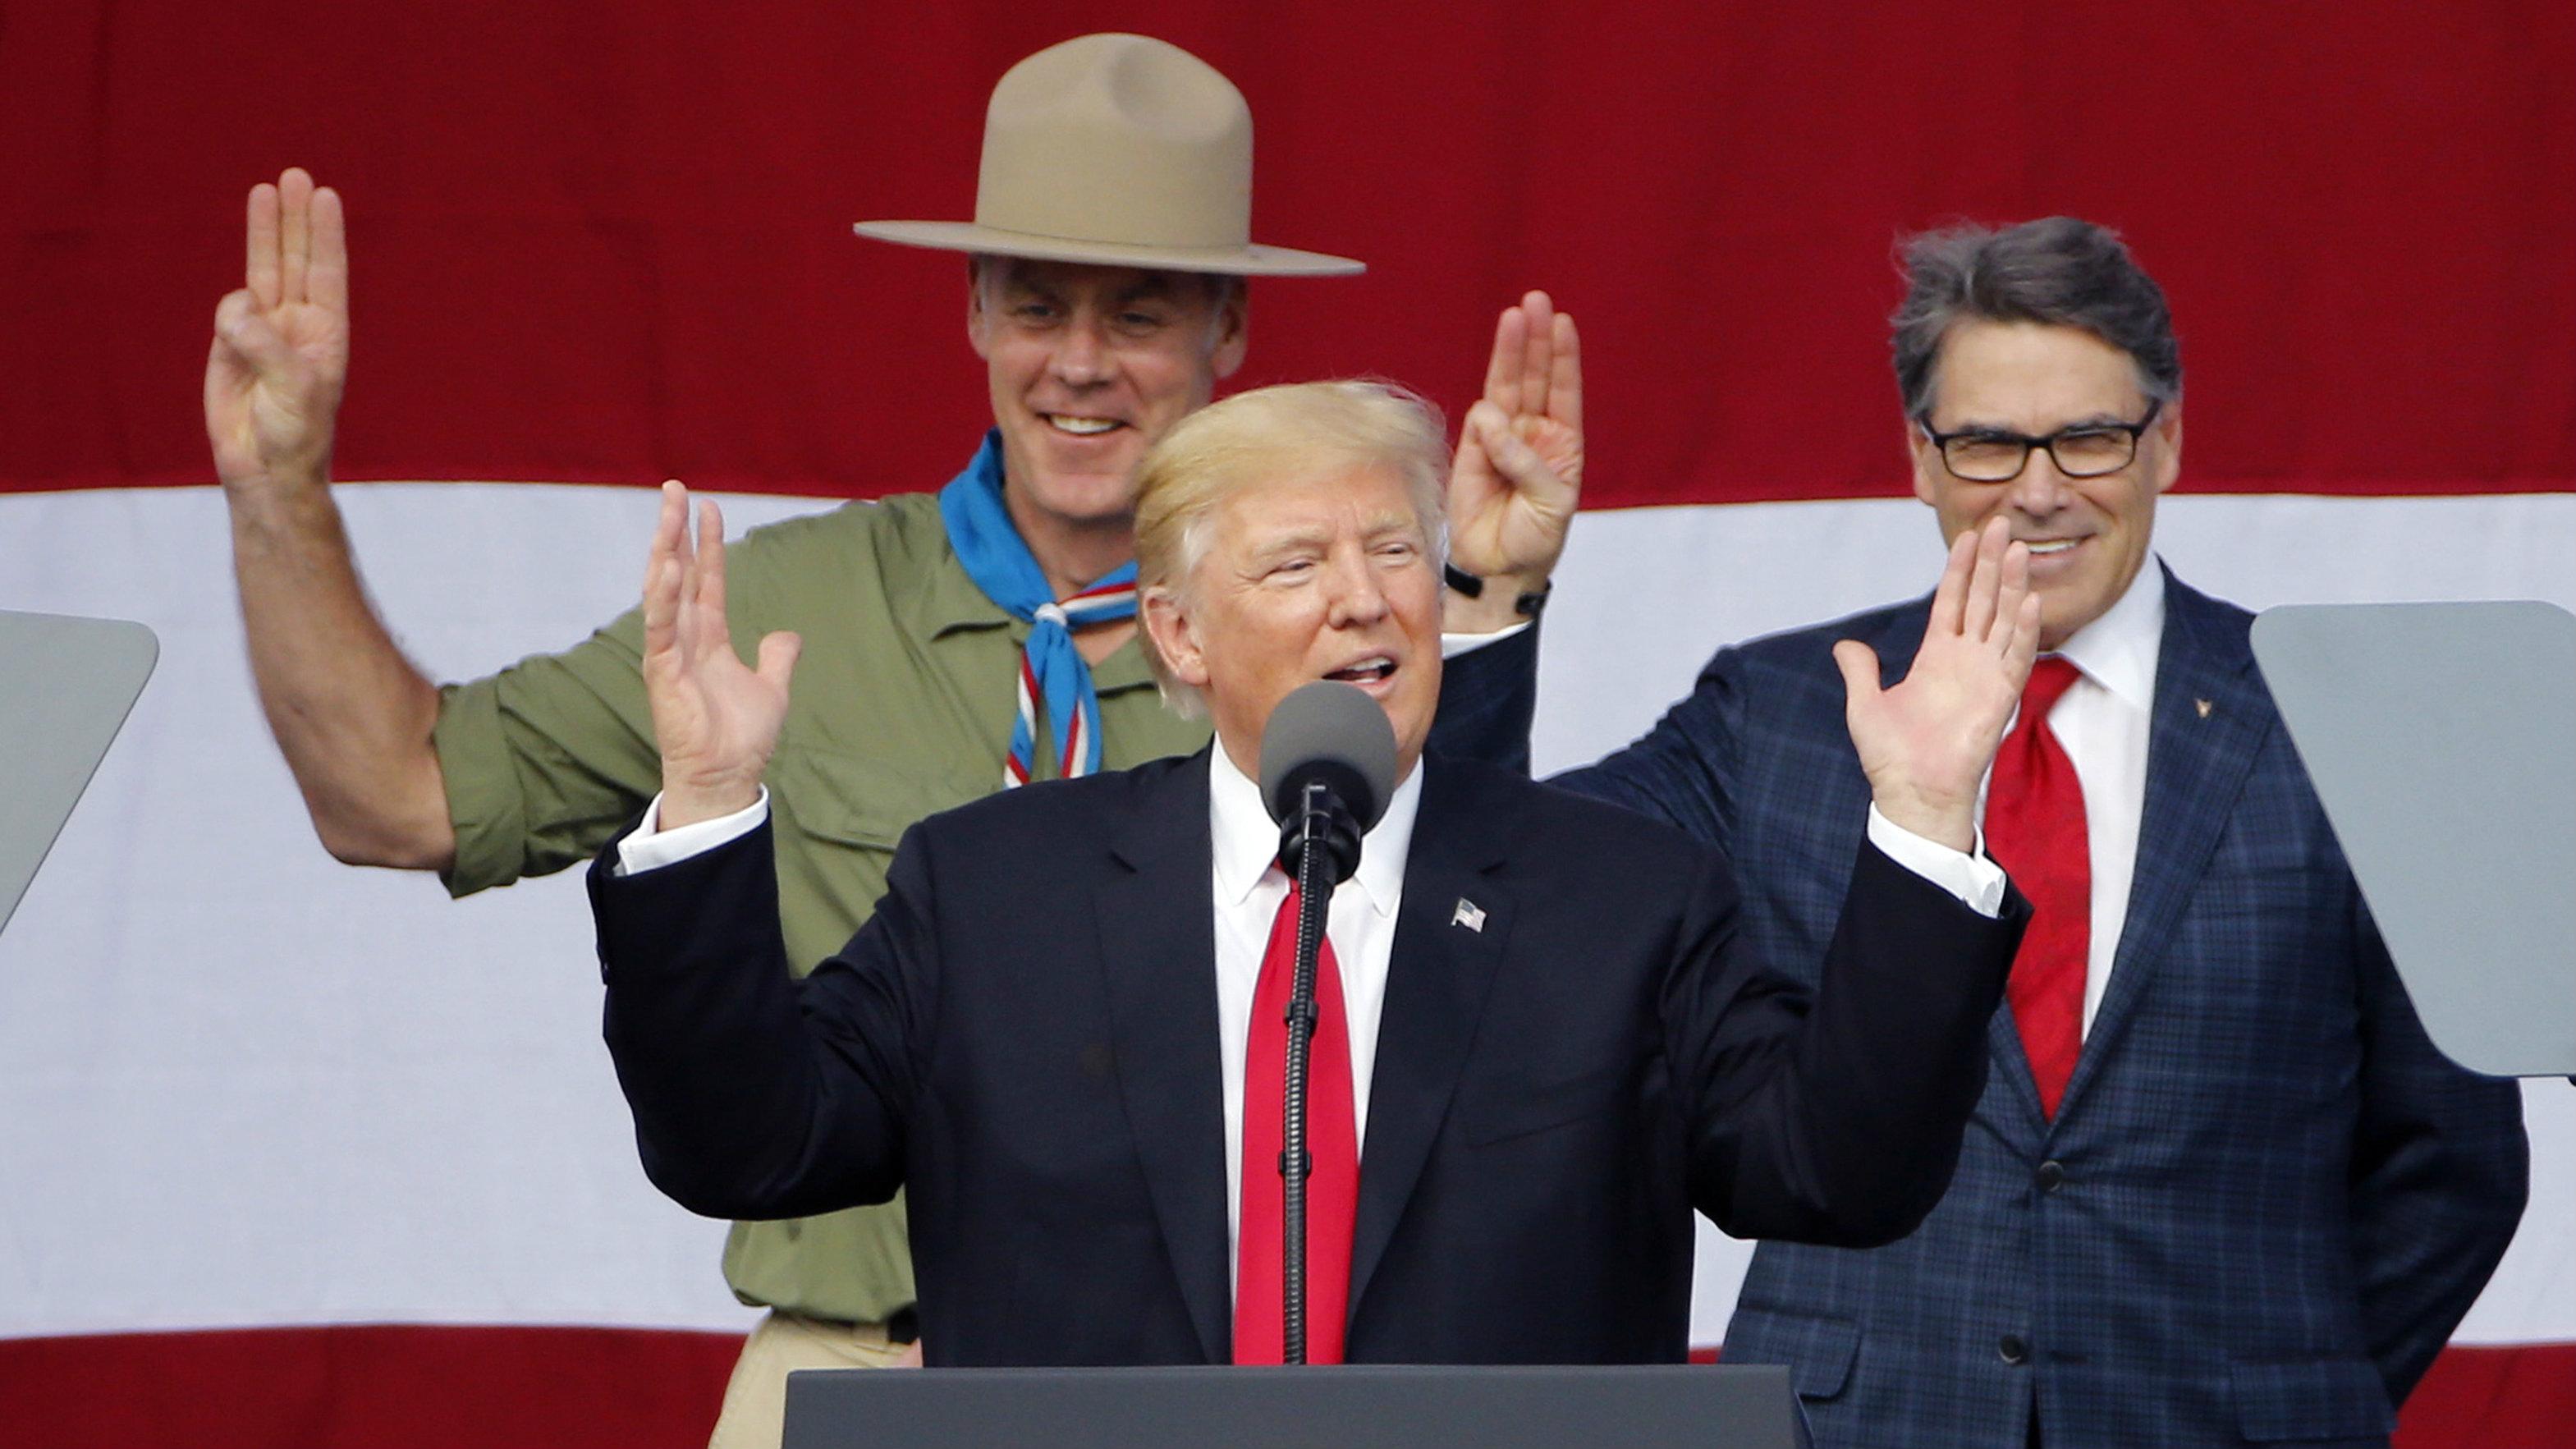 Was donald trump a boy scout